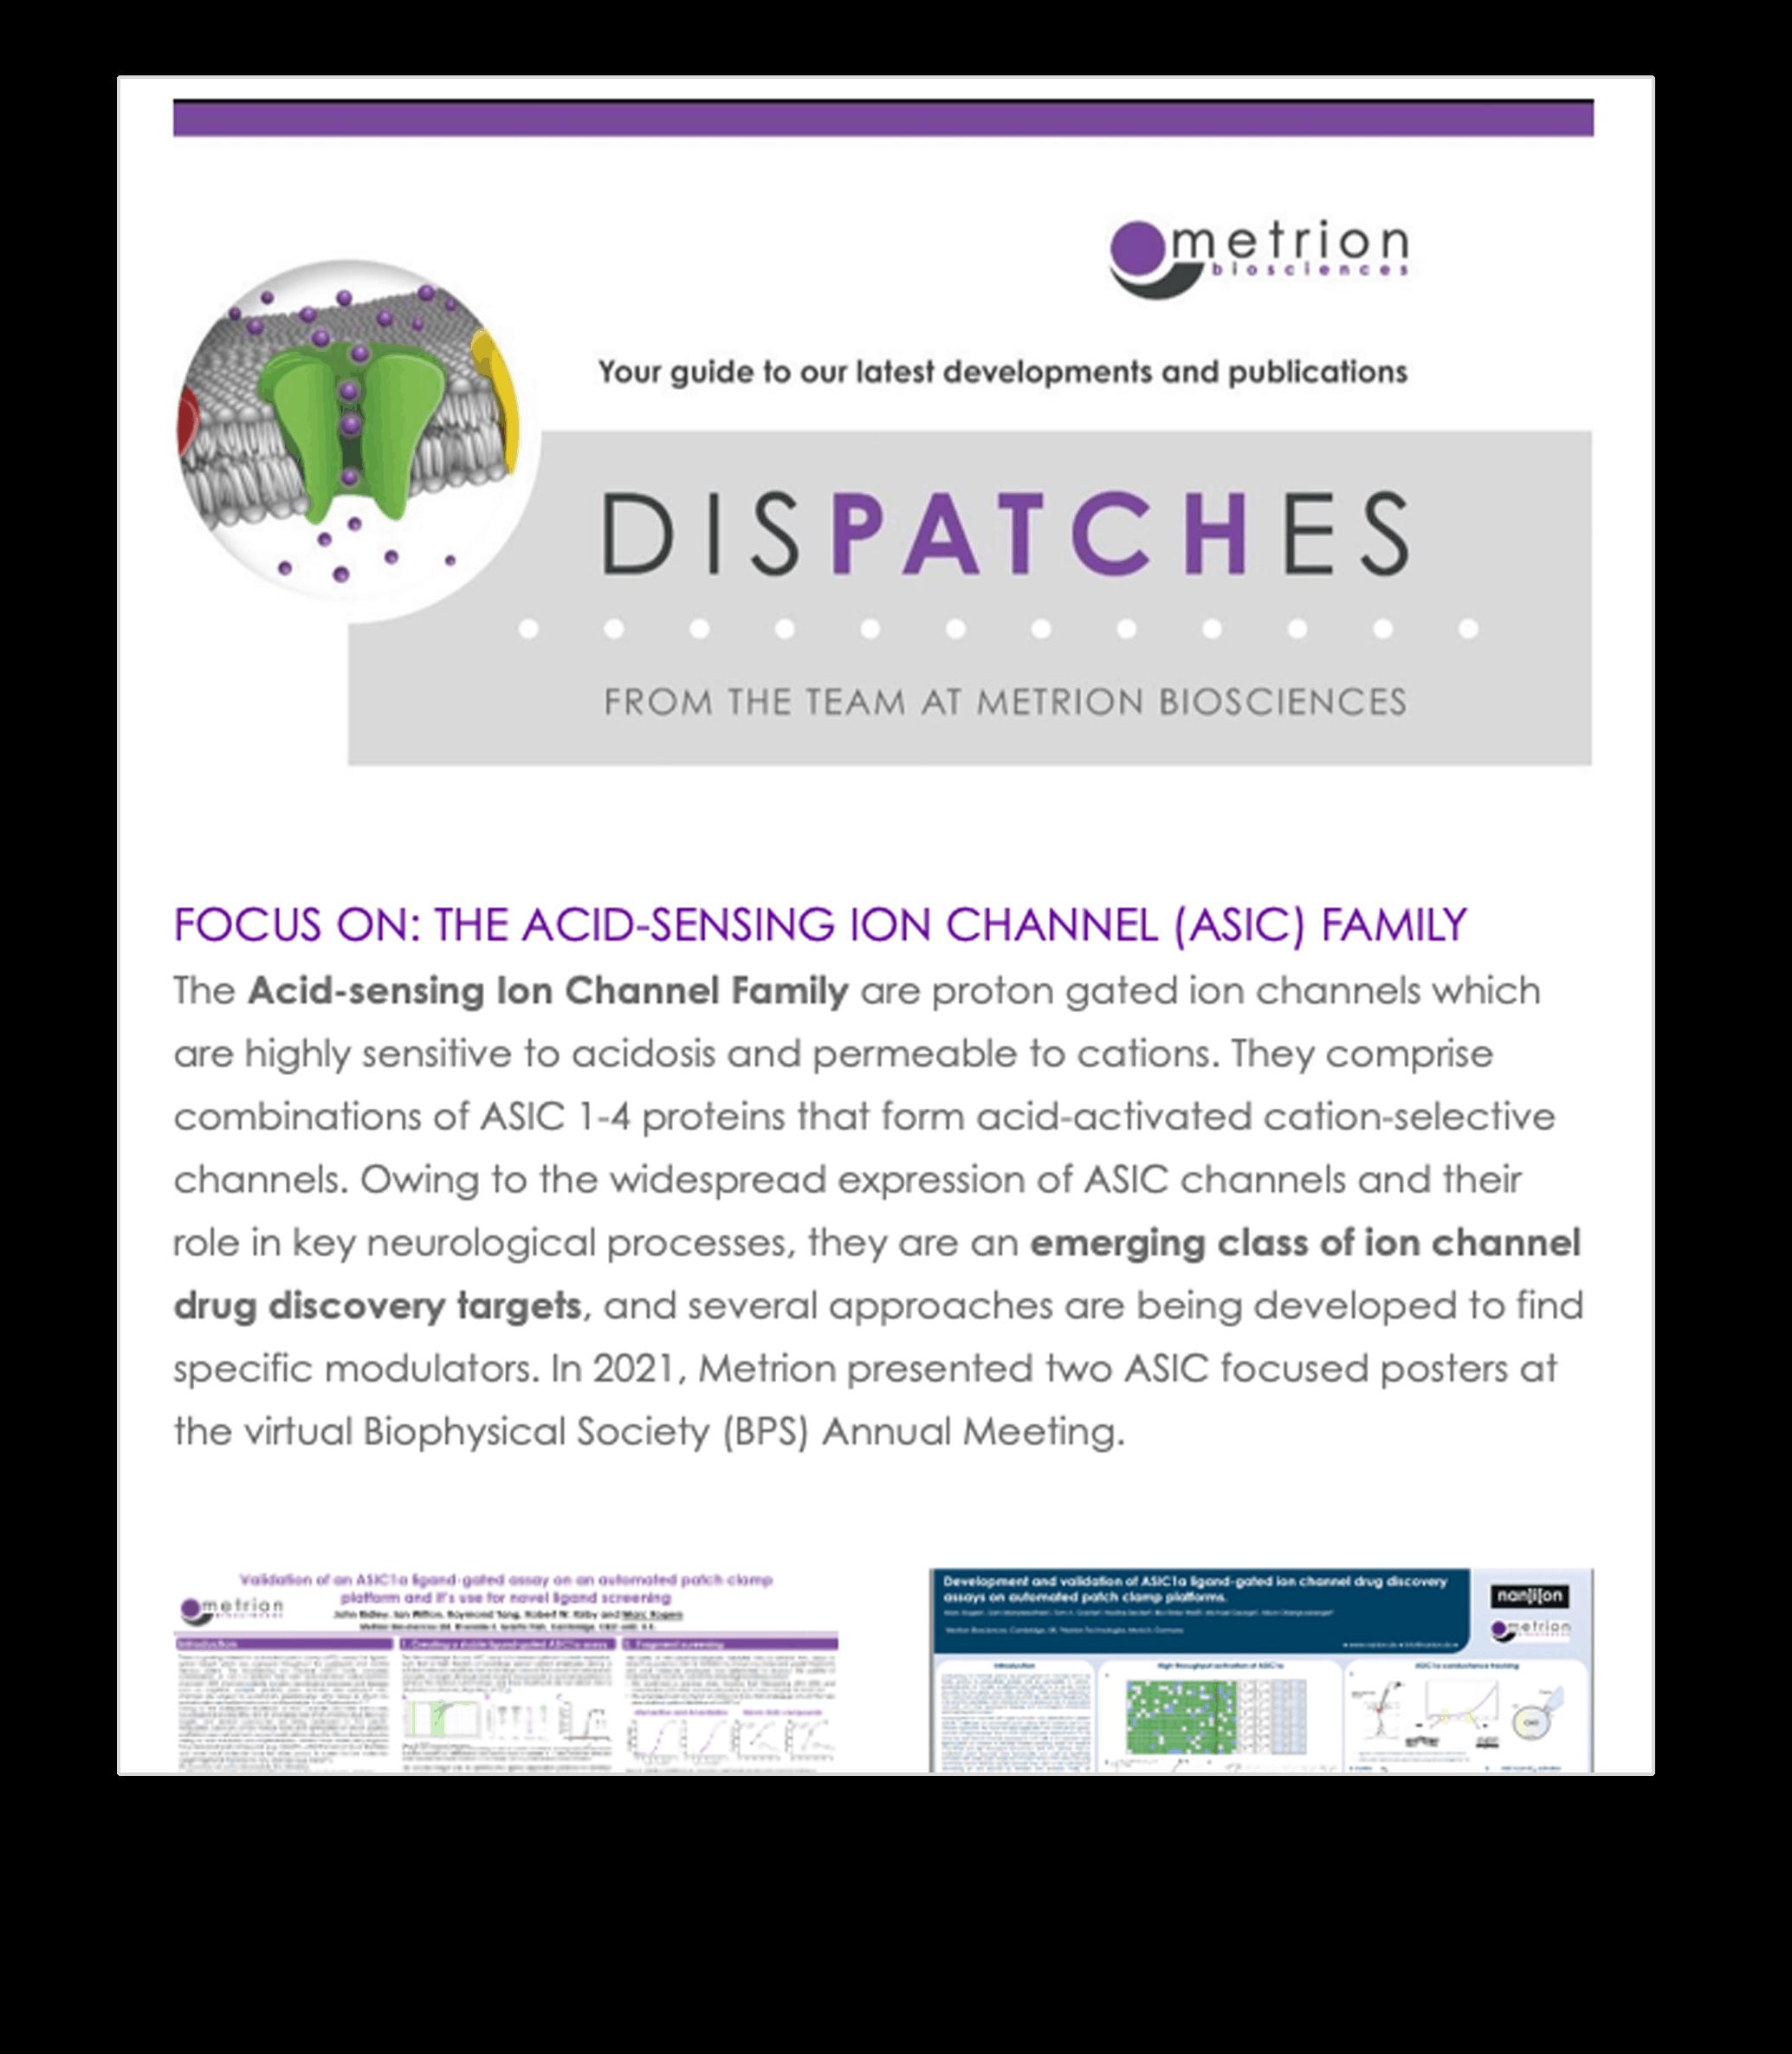 Metrion Biosciences DisPATCHes Newsletter